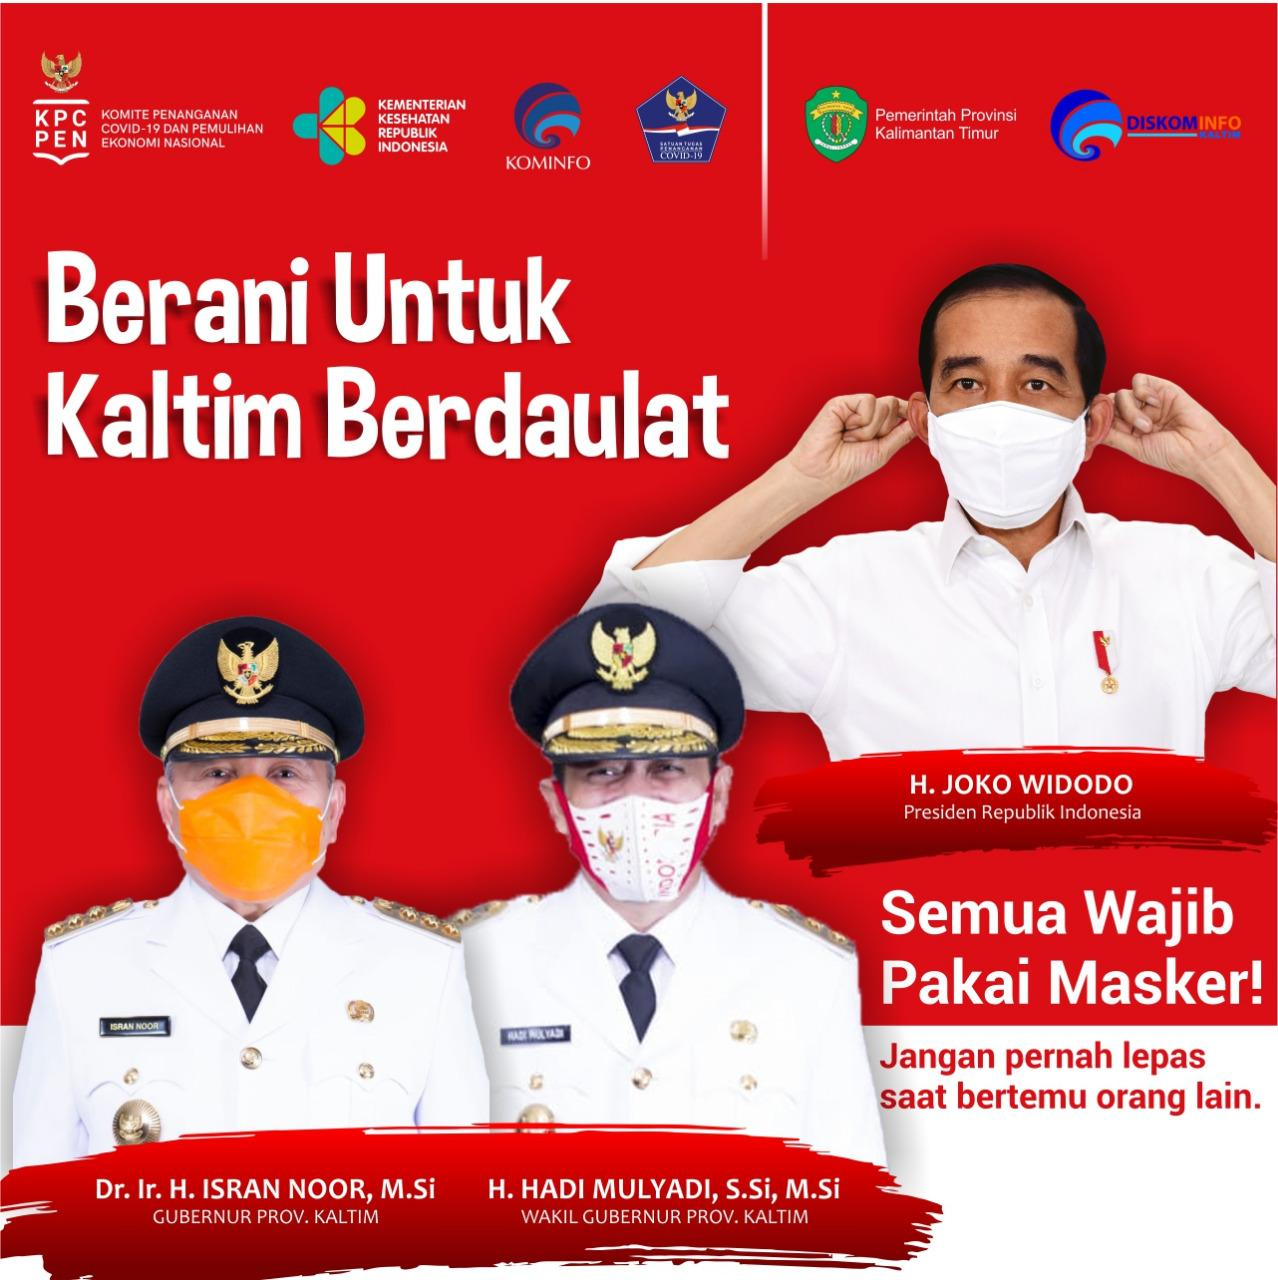 Halo #SobatKom Mari Berani Berdaulat dengan cara menggunakan masker agar kita bersama mencegah penyebaran virus Covid-19.